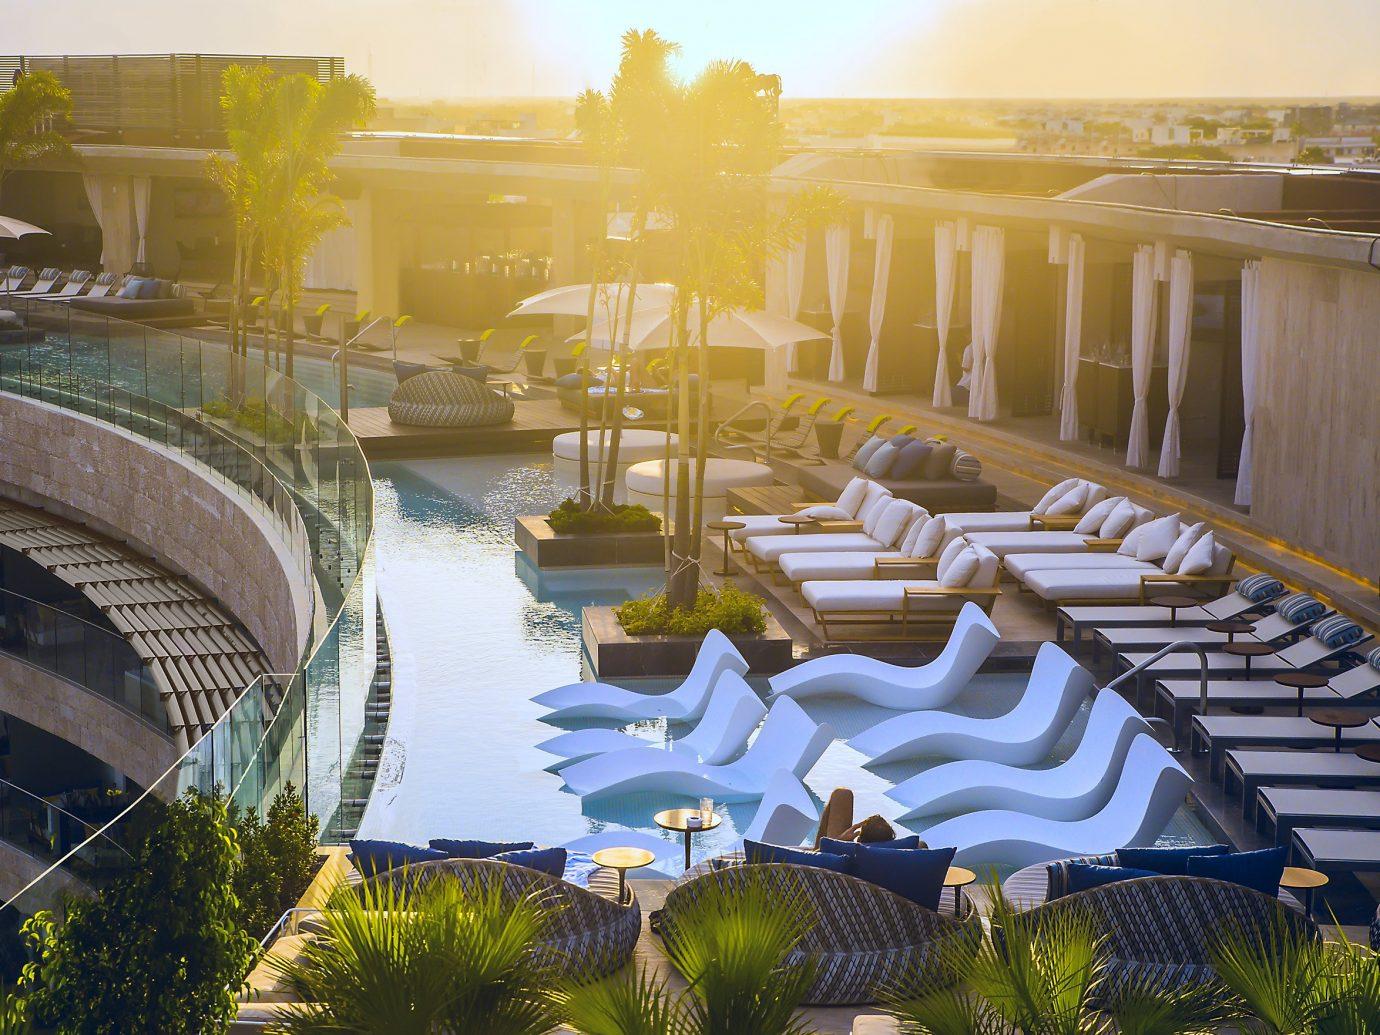 All-Inclusive Resorts Hotels outdoor landmark building estate Resort palace